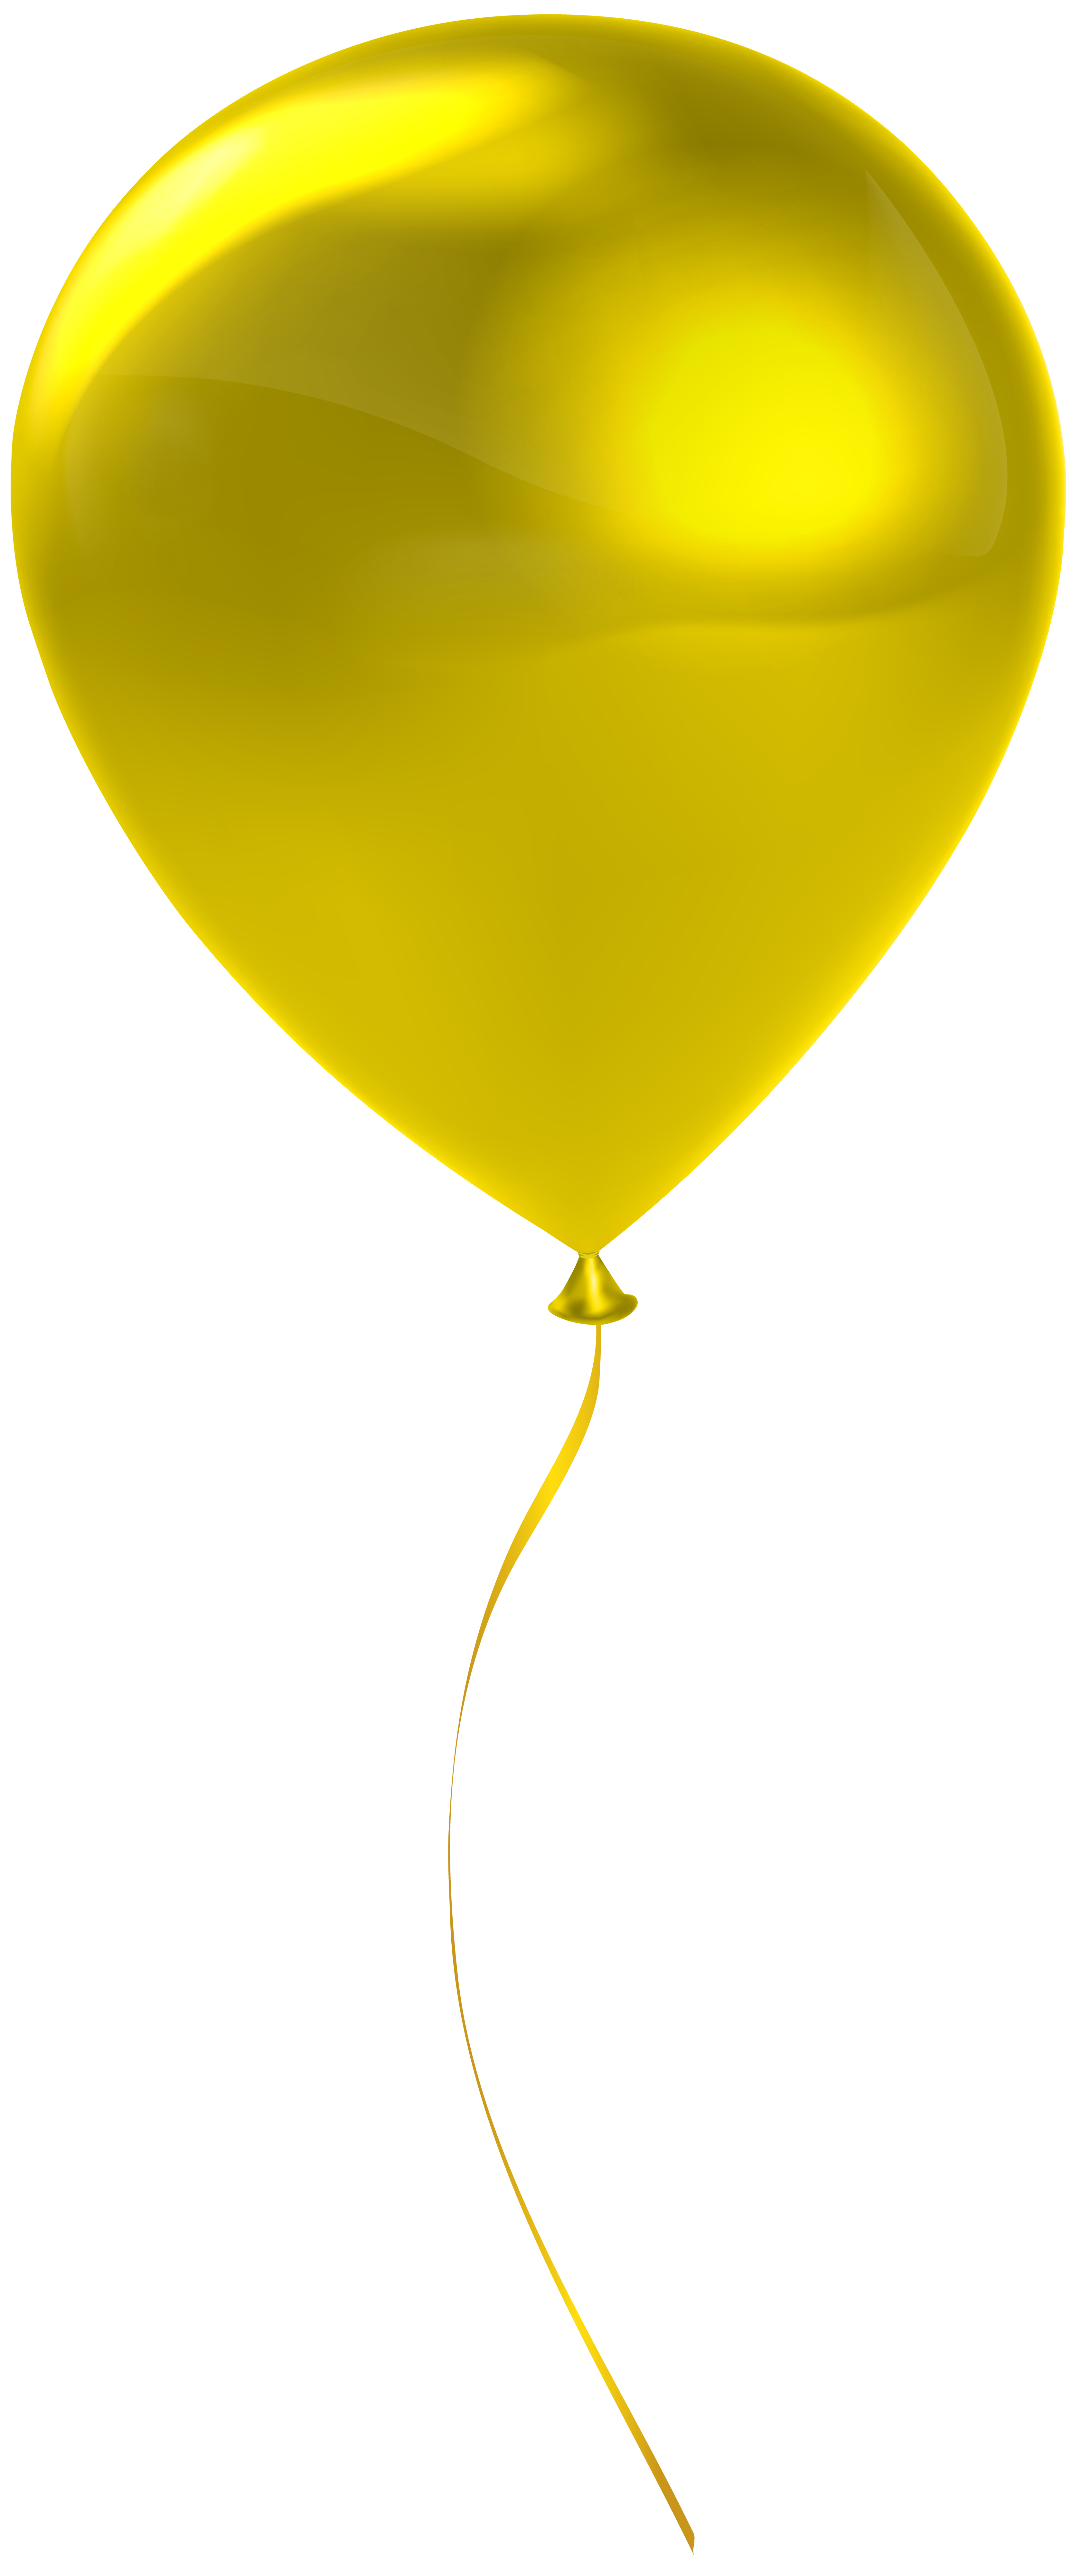 Clipart balloon brown. Single yrllow transparent clip